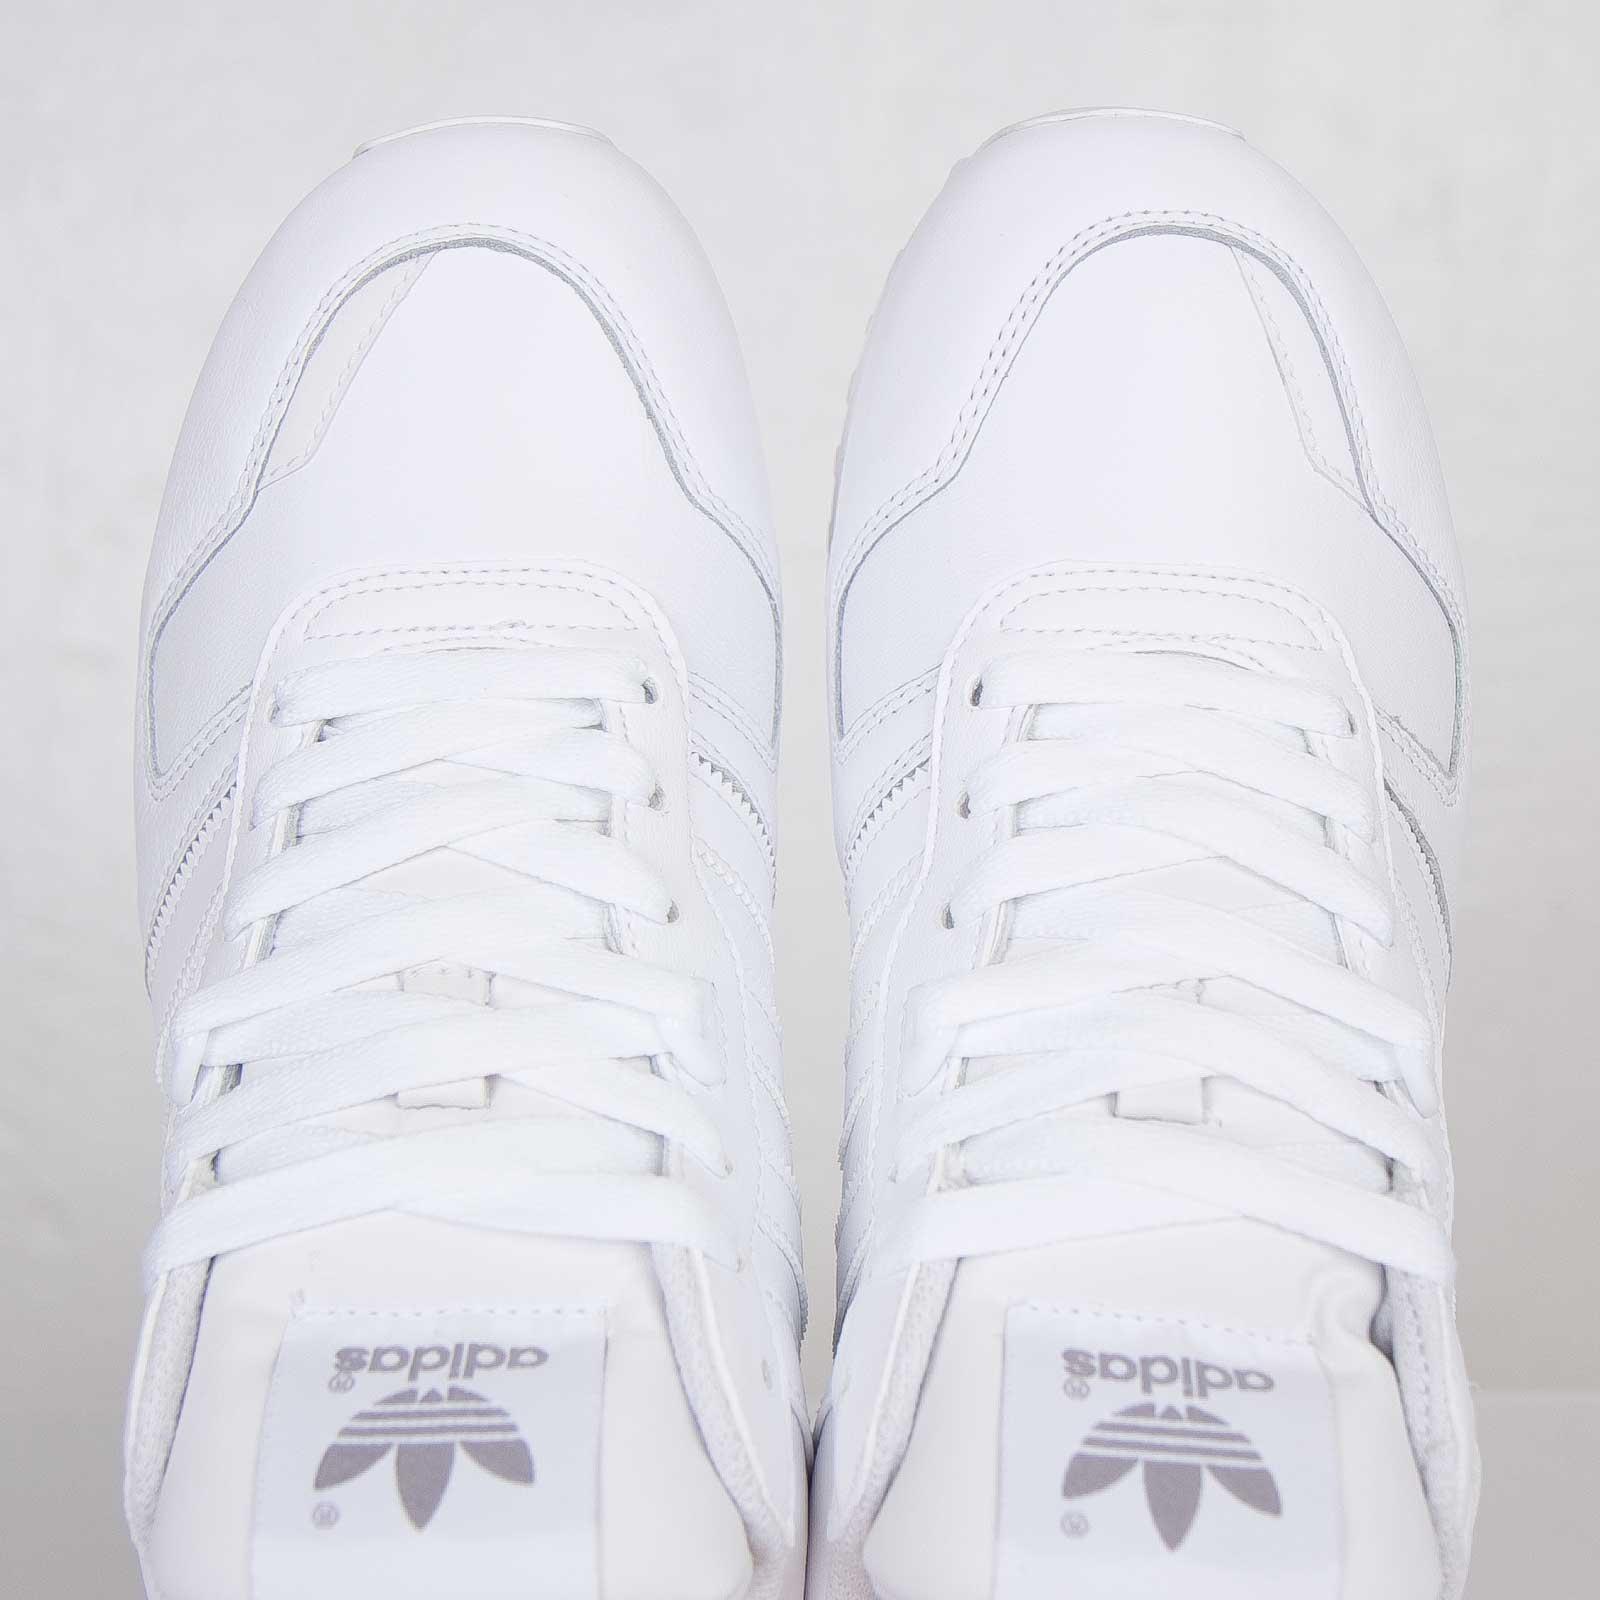 84459a2cbf2b9 adidas ZX 700 - G62110 - Sneakersnstuff